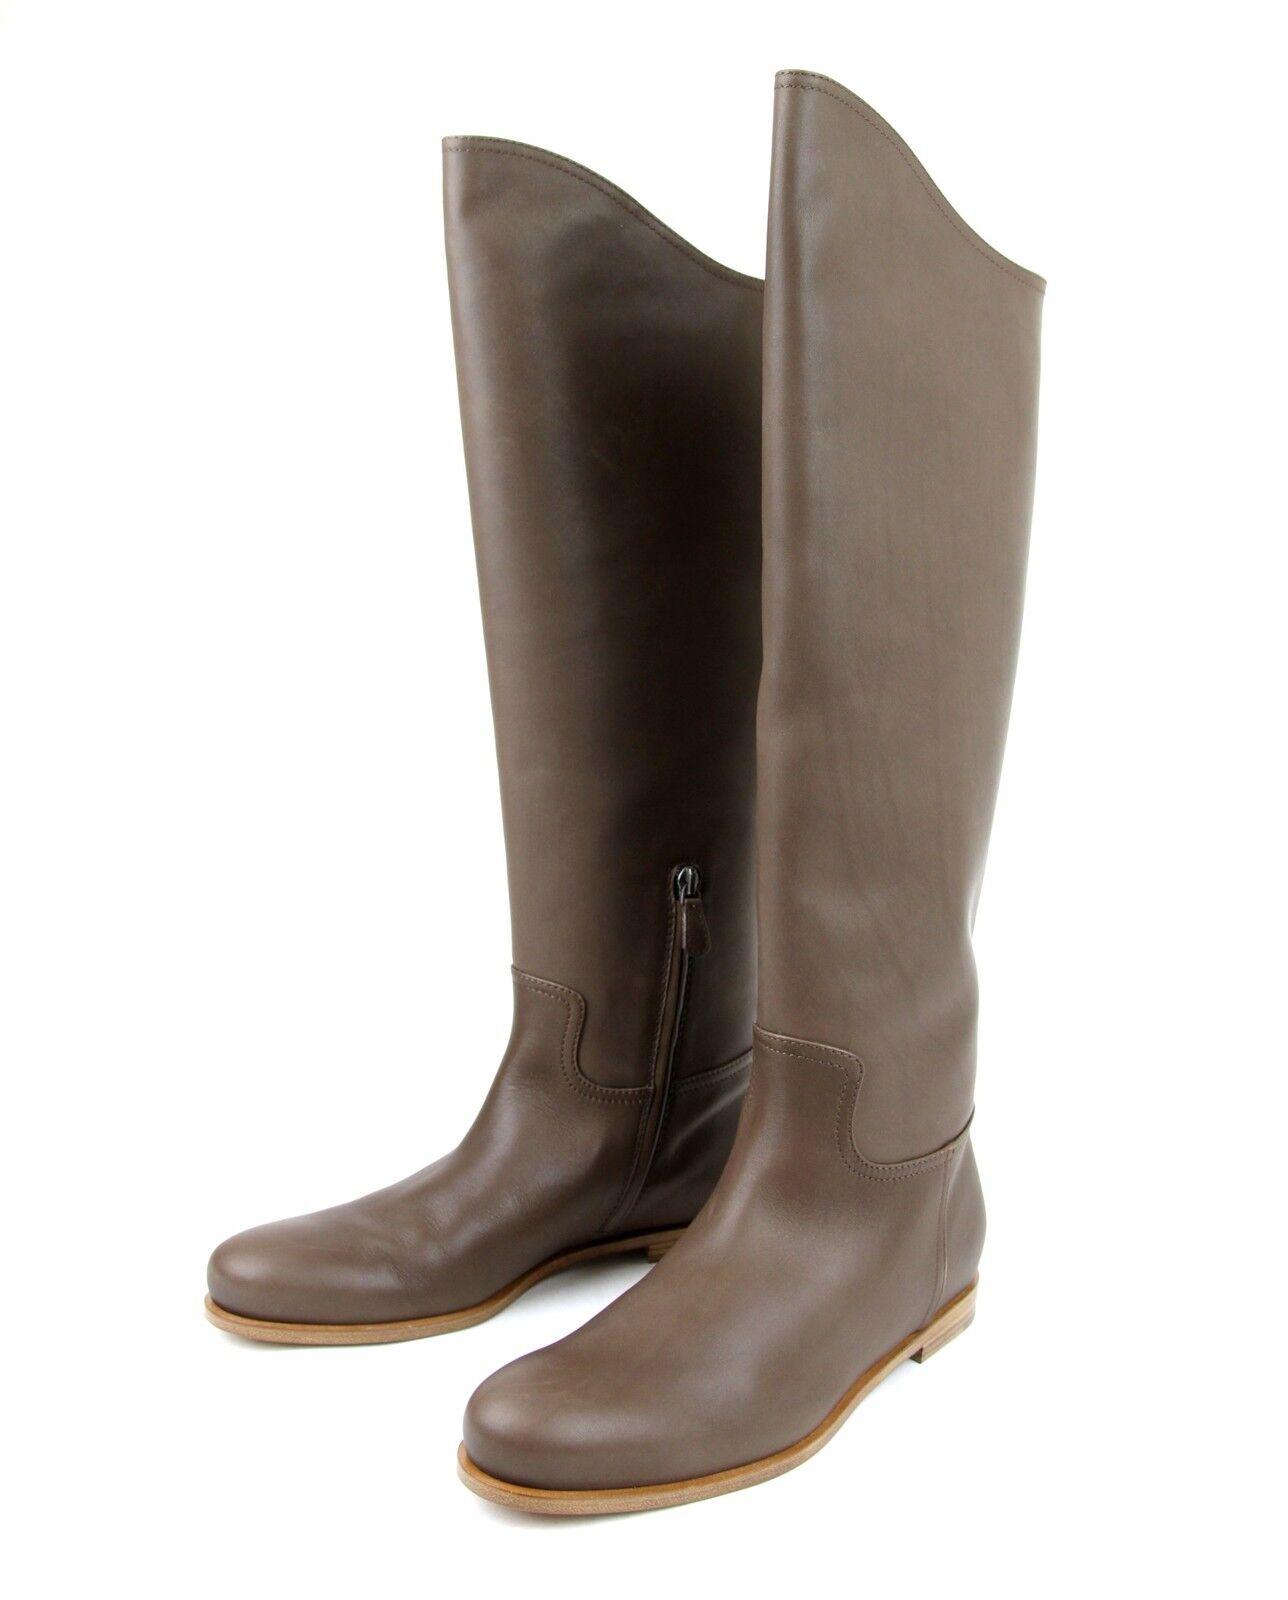 1280 New Authentic Bottega Veneta Leather Tall Stiefel, braun, 297865 2515